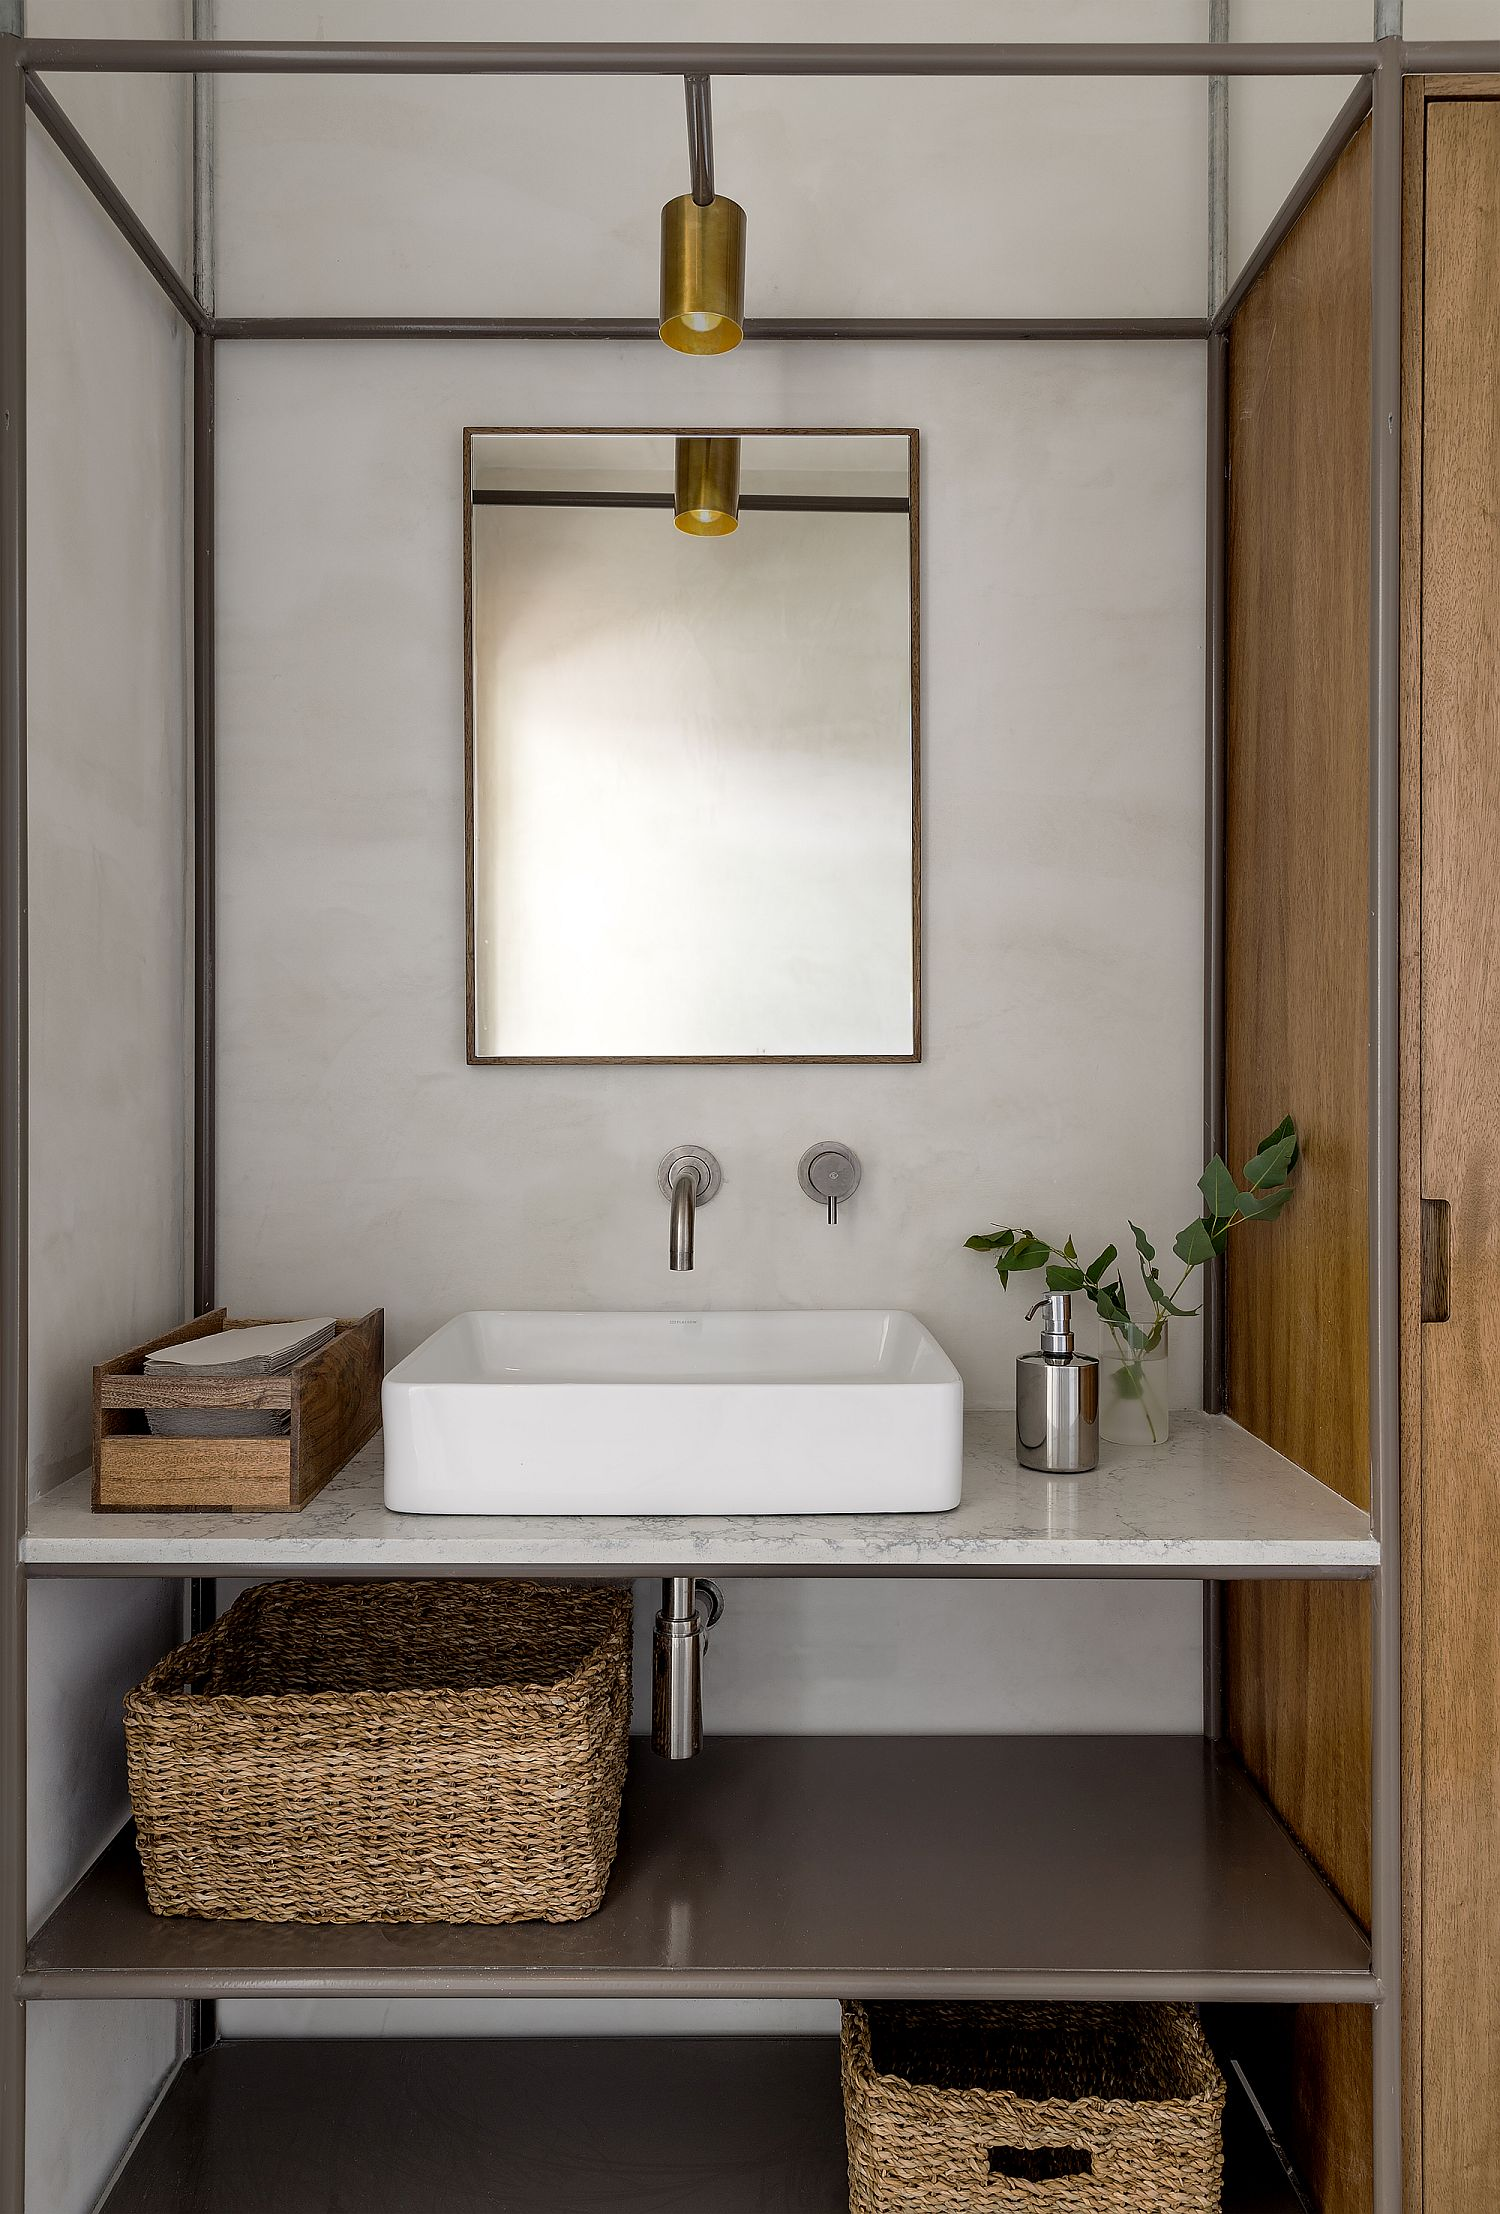 Fabulous-and-stylish-modern-industrial-bathroom-inside-the-Teller-Bakery